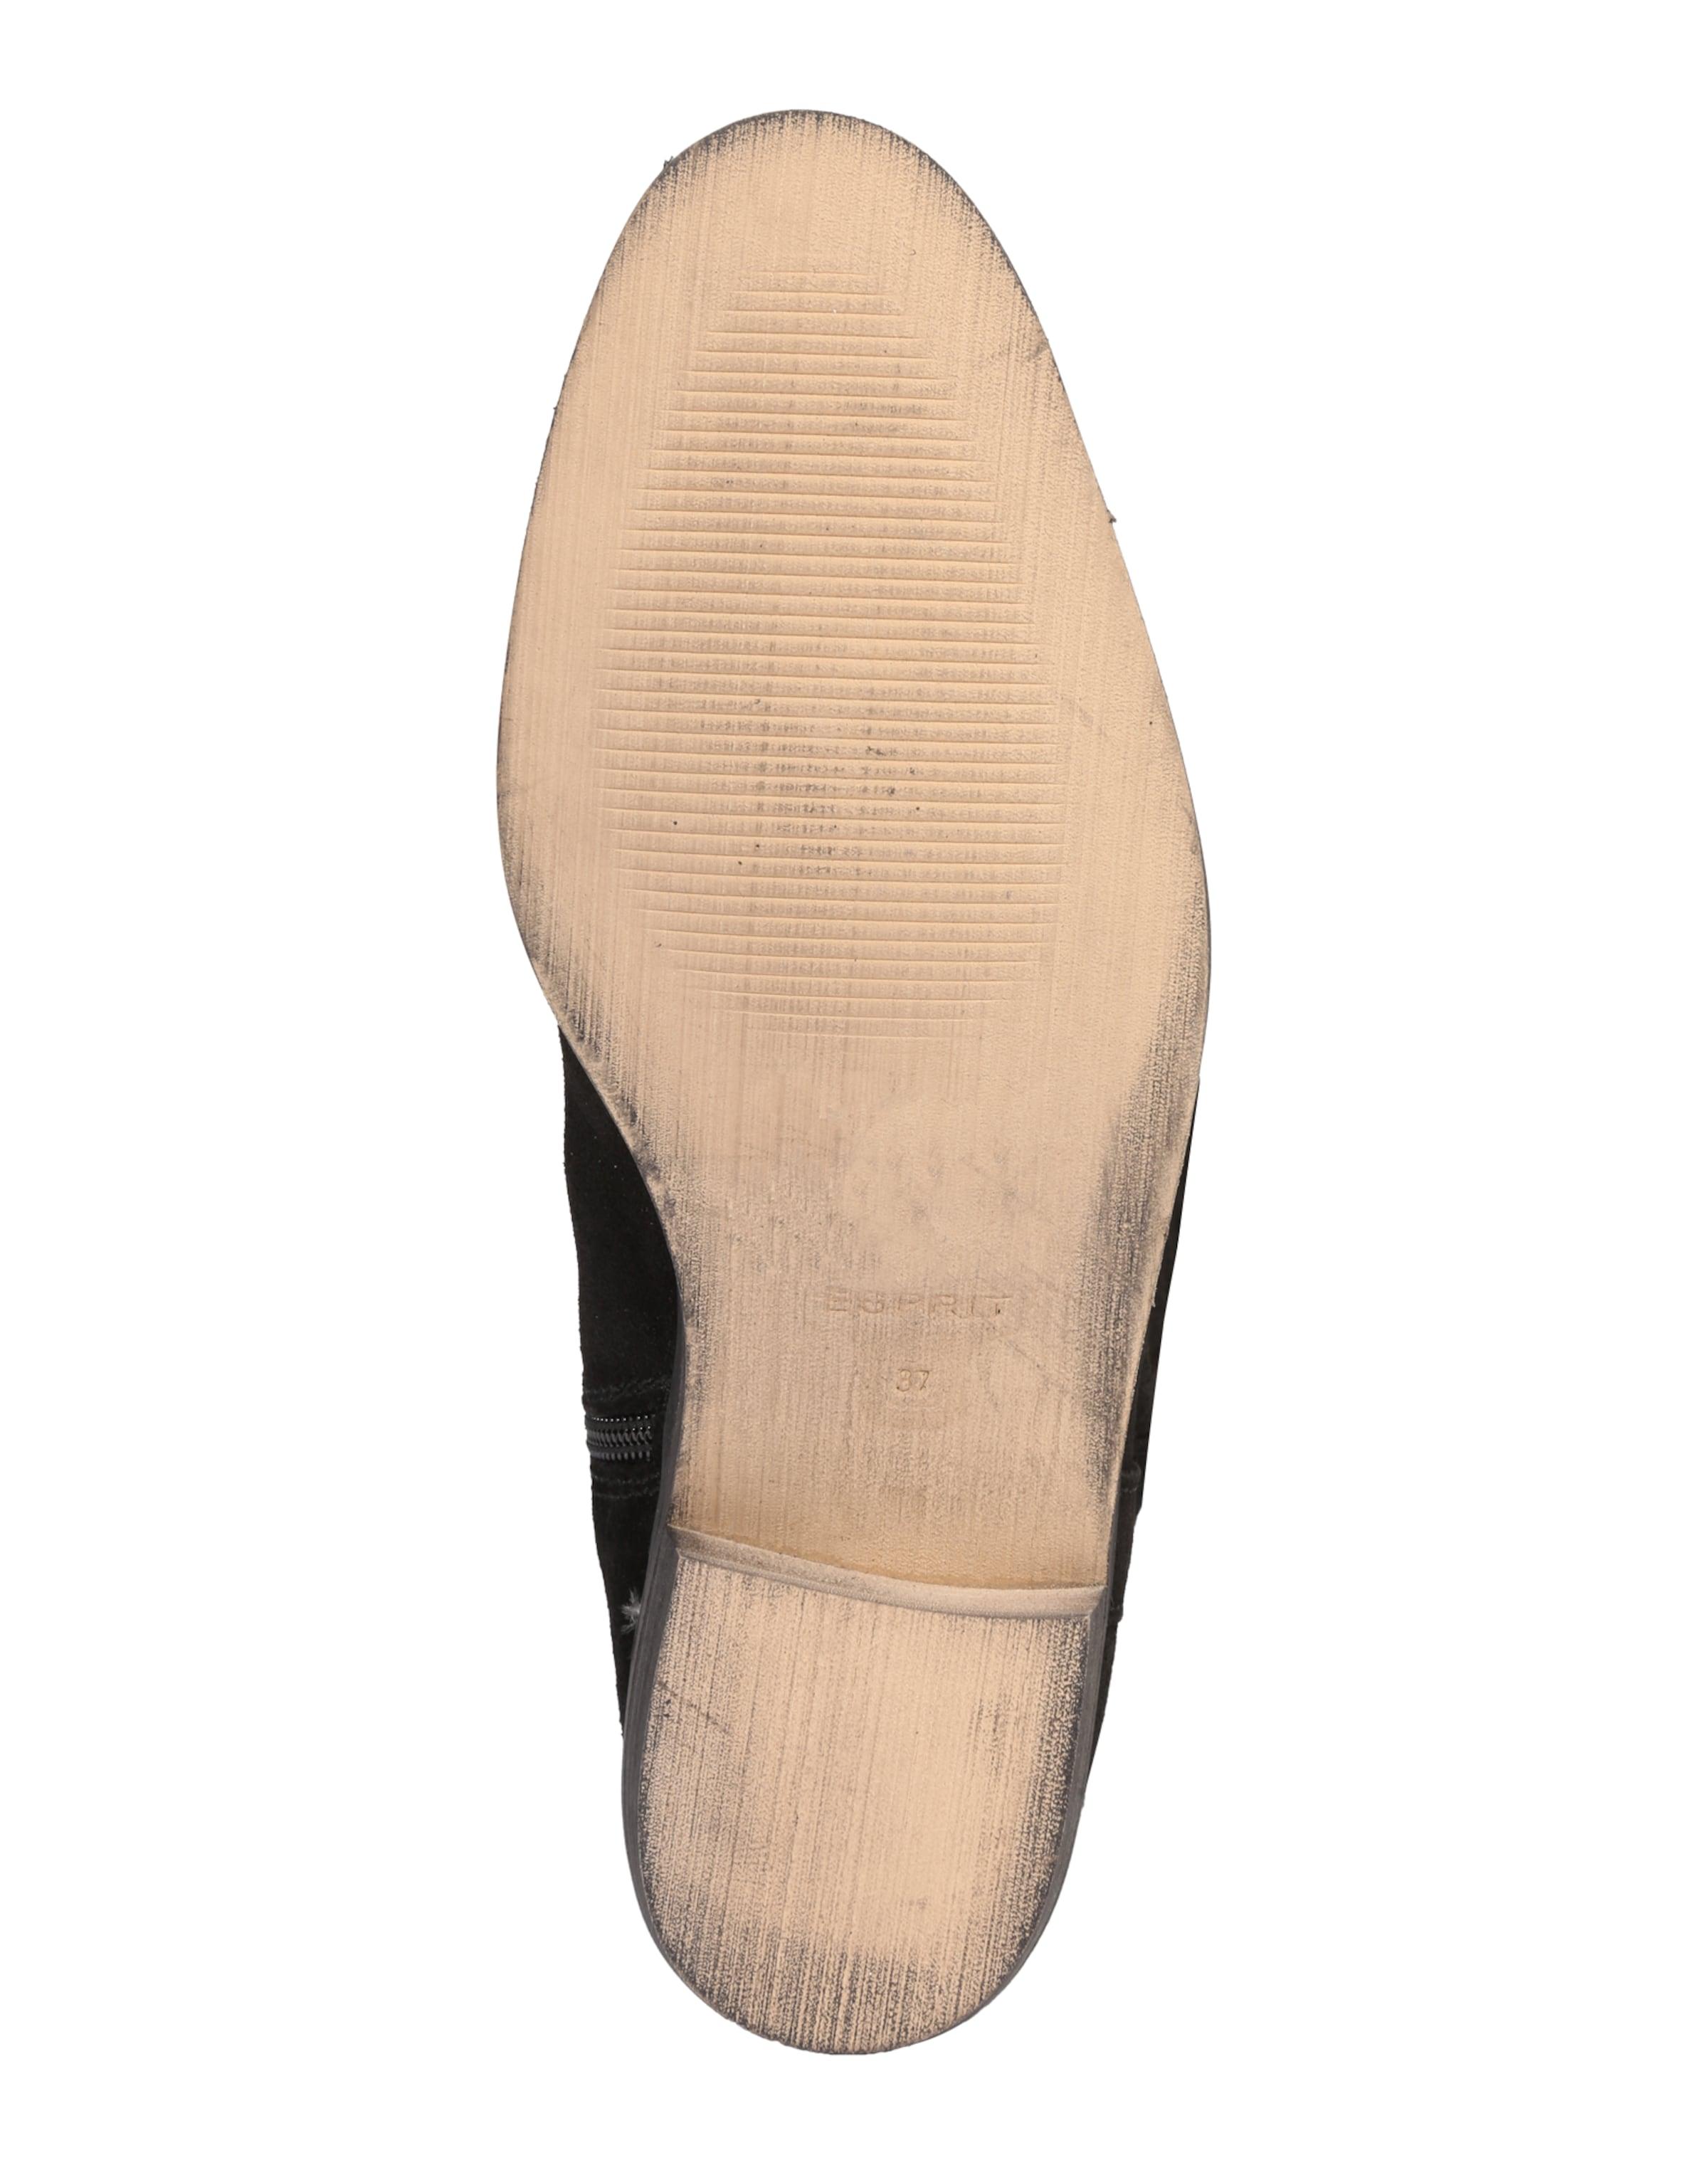 Stiefel 'Marthe' 'Marthe' 'Marthe' ESPRIT Stiefel 'Marthe' Stiefel ESPRIT ESPRIT 'Marthe' Stiefel Stiefel 'Marthe' ESPRIT ESPRIT Stiefel ESPRIT Iqwz0Cq